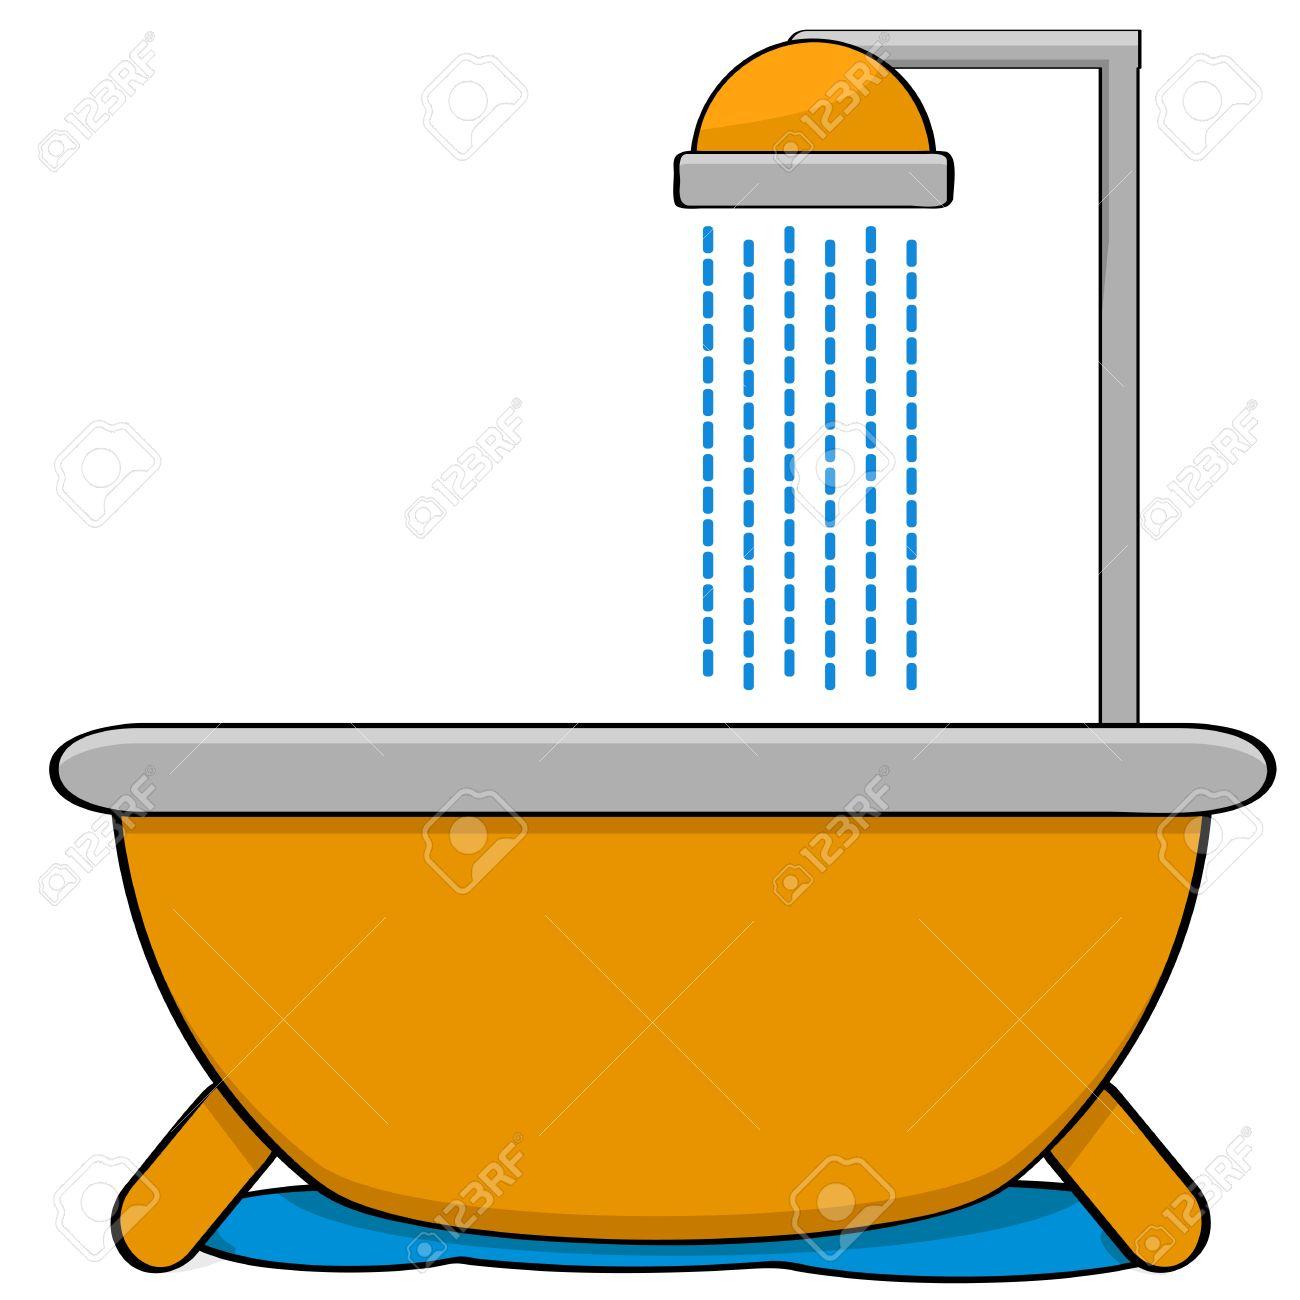 Duschkopf clipart  Badewanne Cartoon Lizenzfreie Vektorgrafiken Kaufen: 123RF